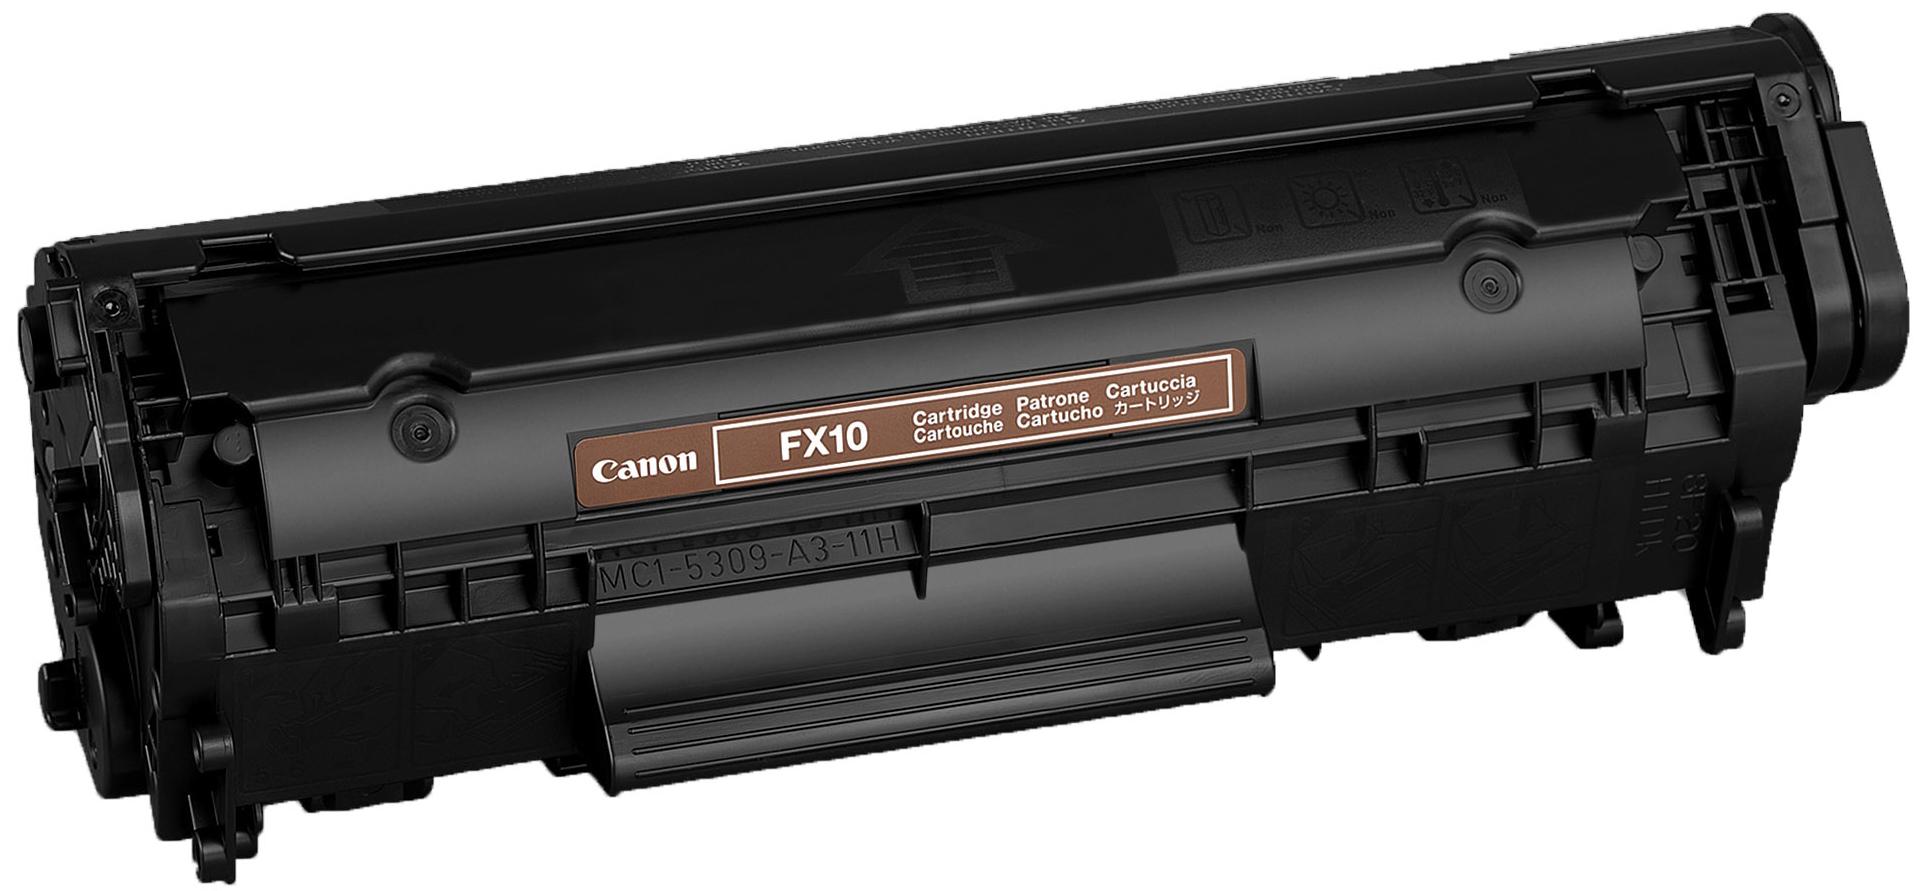 Canon FX-10 - картридж для факсов Canon i-SENSYS MF4000/FAX-L95/L100/L120/L140/L160 (Black)  free shipping for canon fx9 fx 9 toner cartridge for canon fax l100 l120 l140 l140g l160 160g laser printer